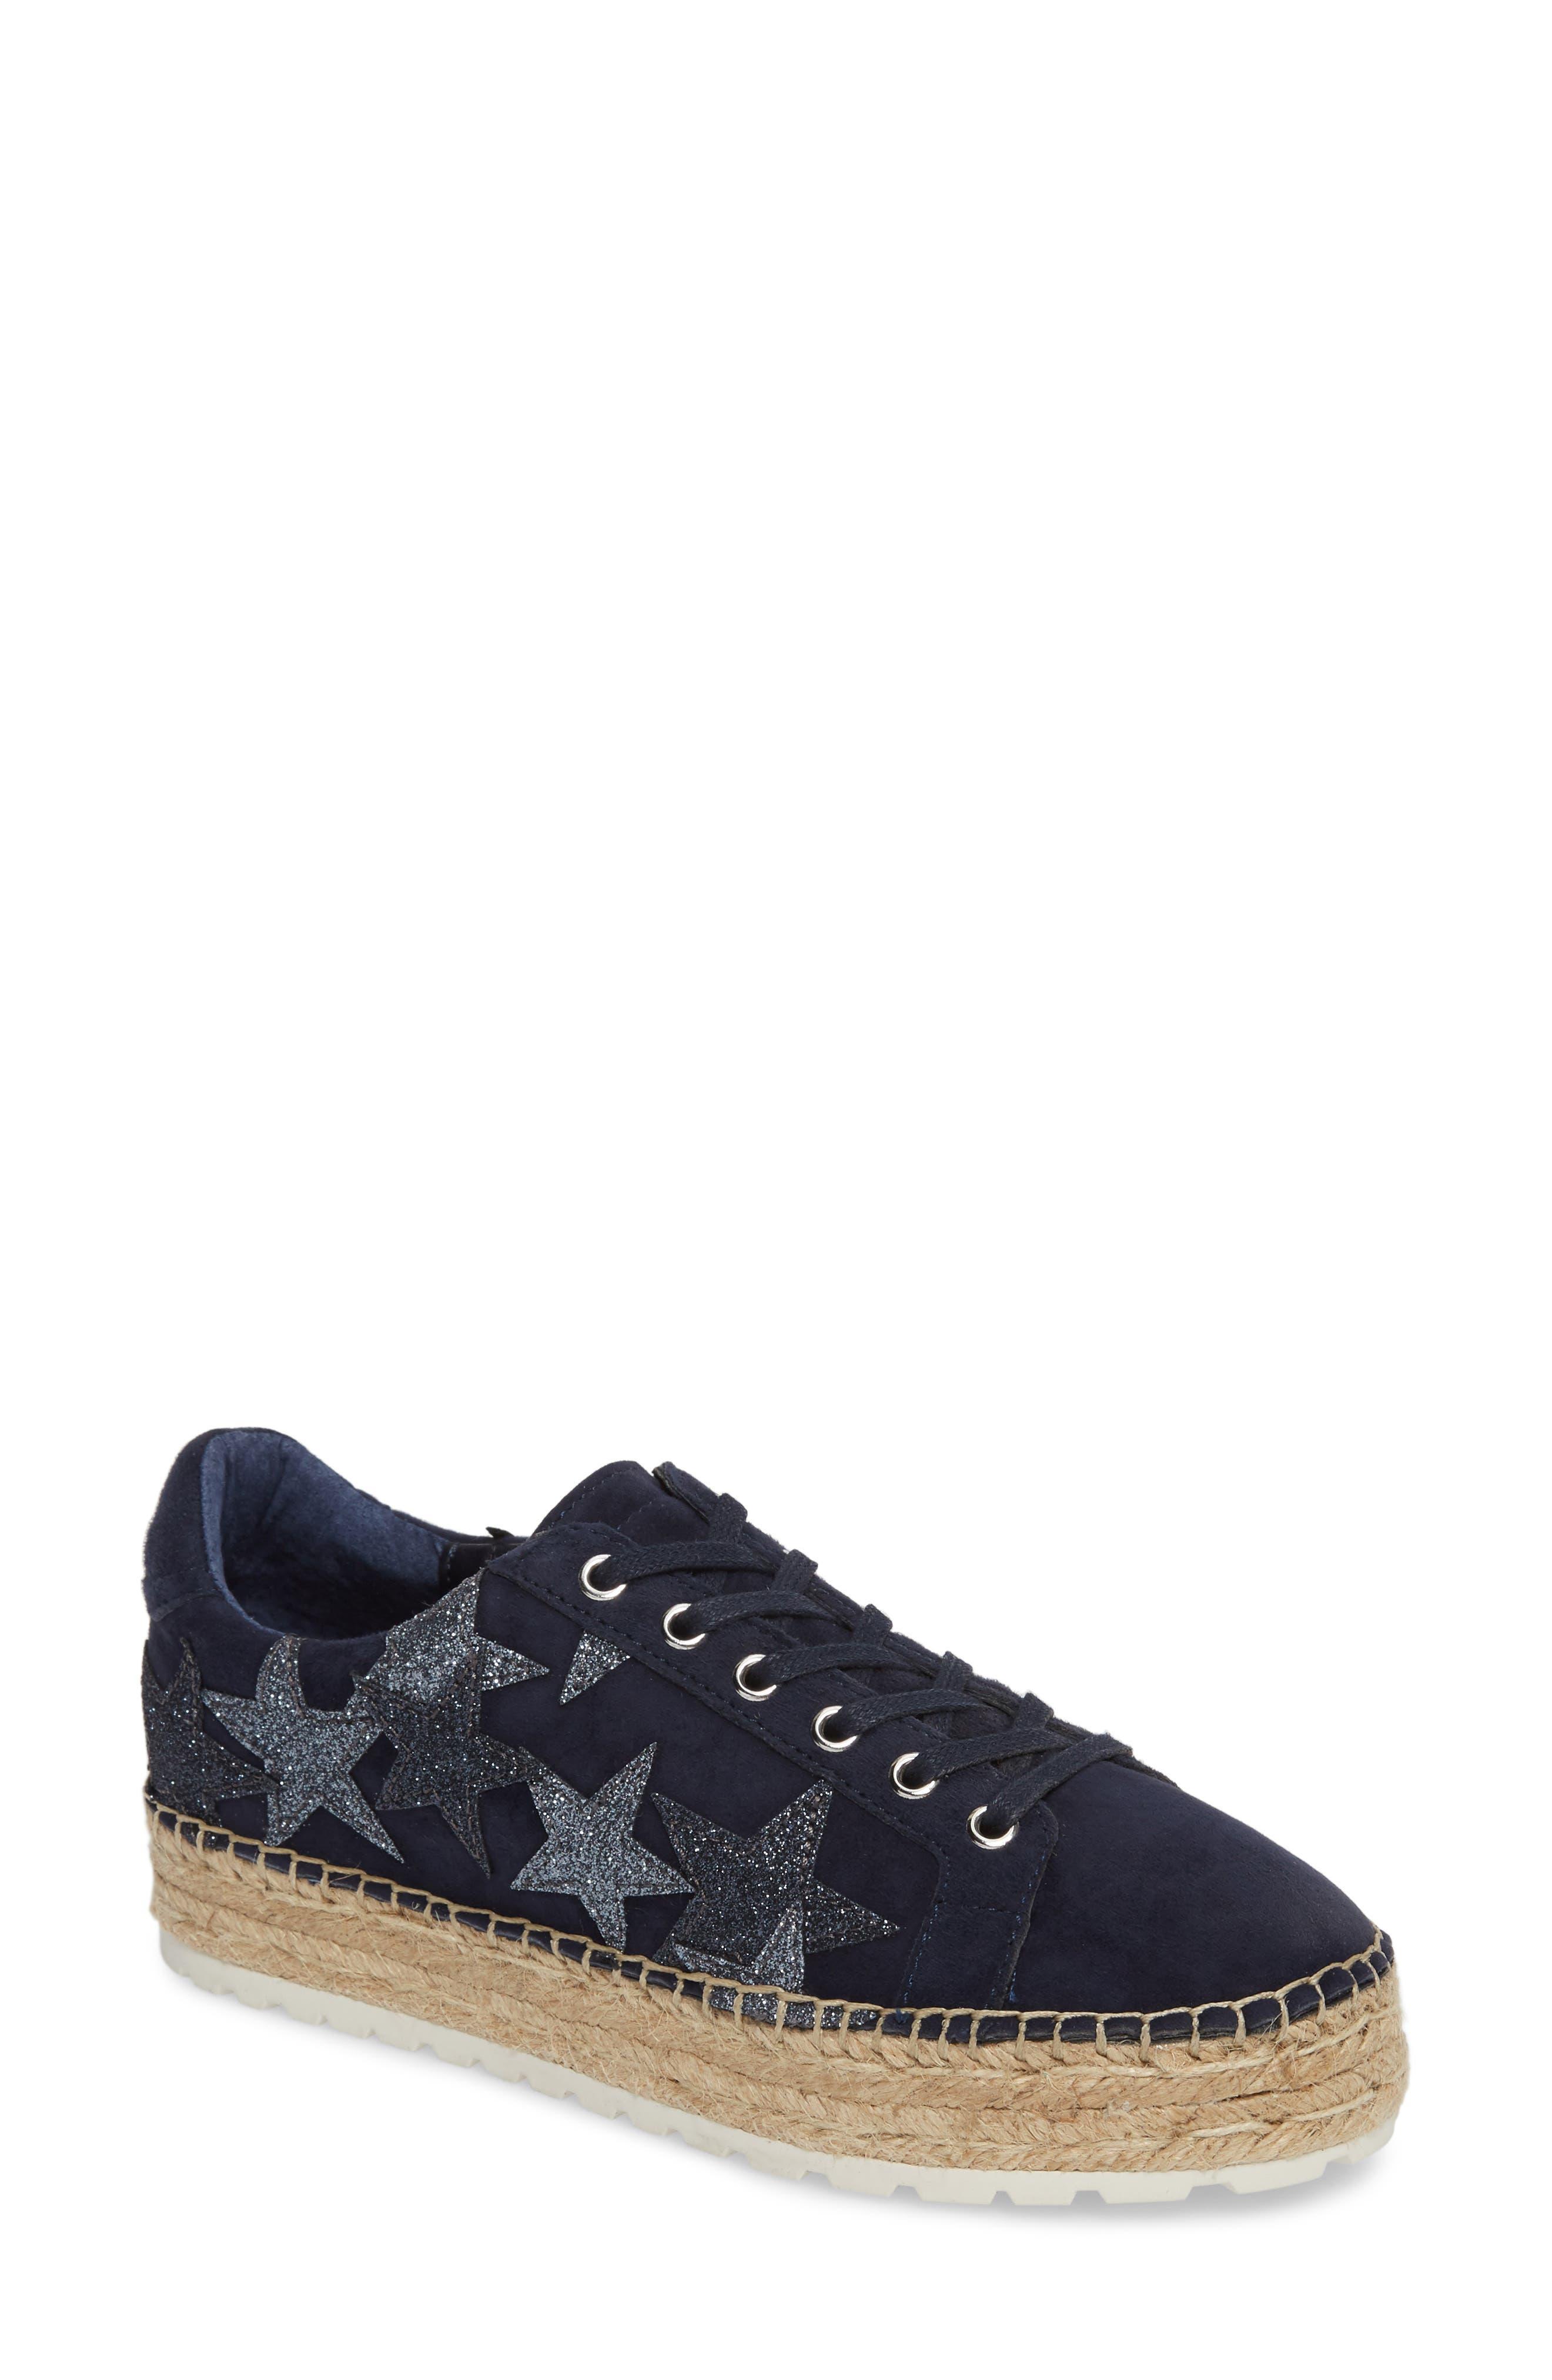 Marc Fisher LTD Maevel Espadrille Sneaker (Women)